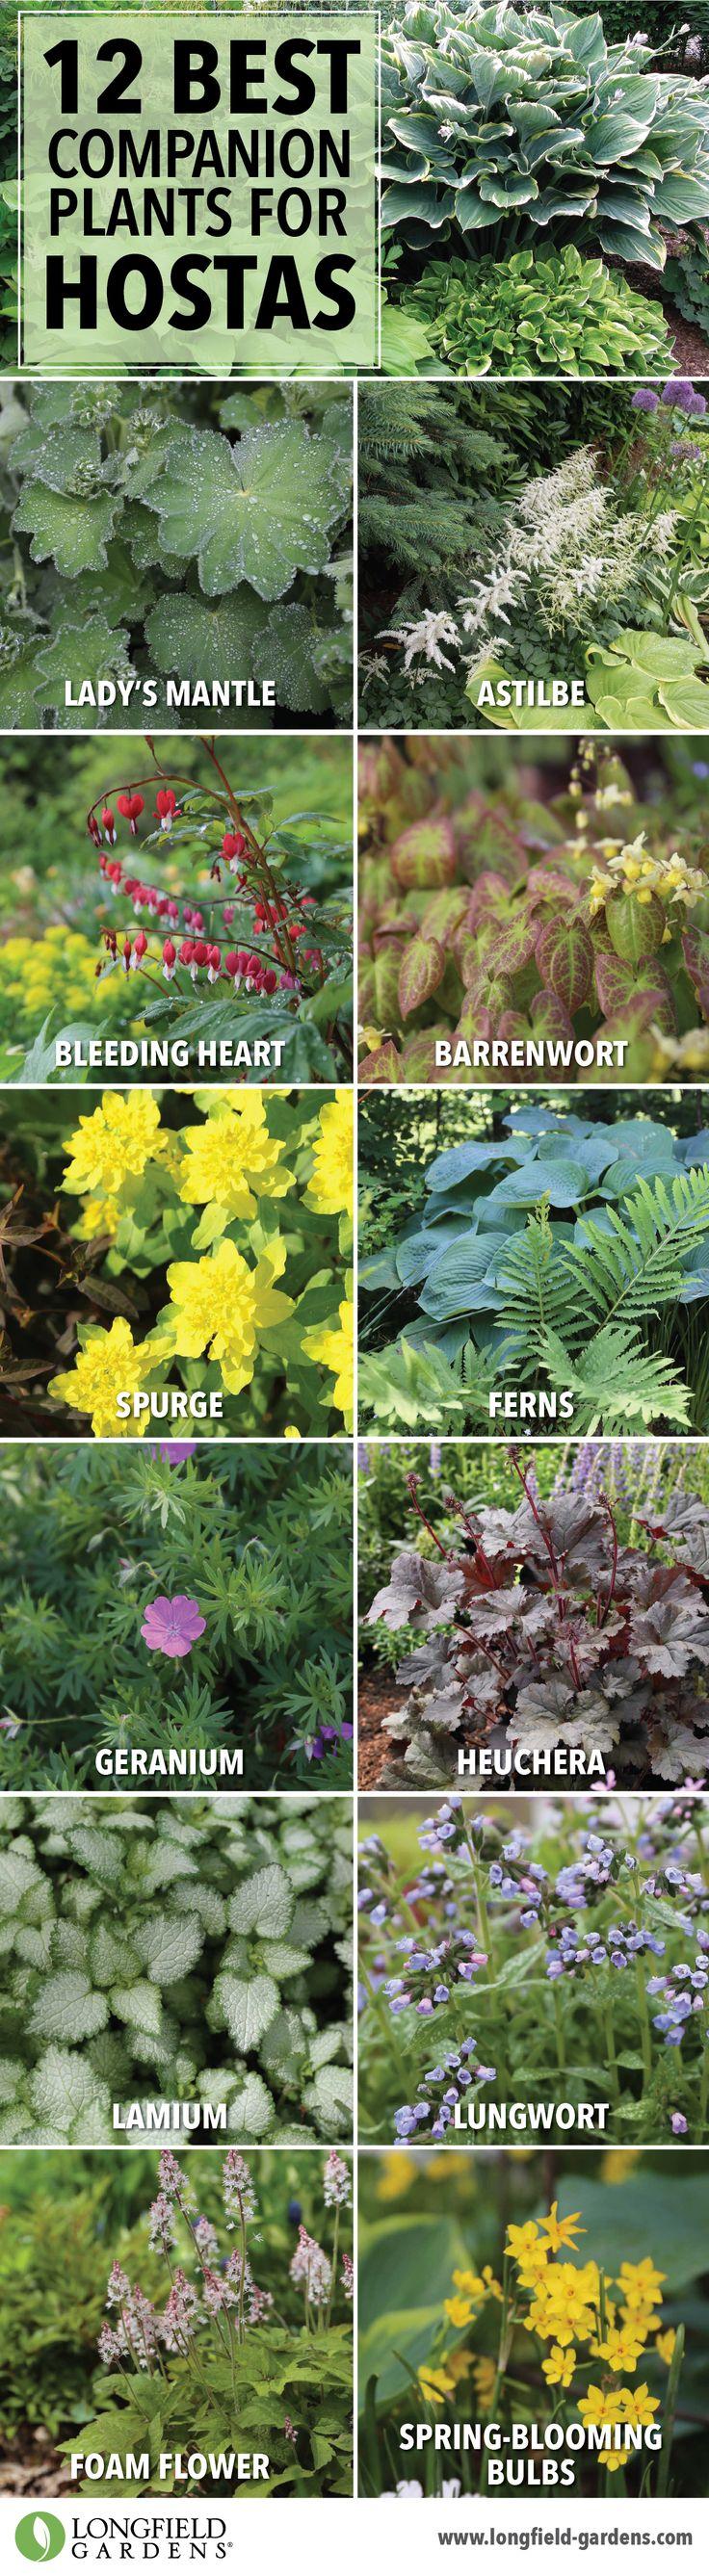 Companion plants for hostas. ...